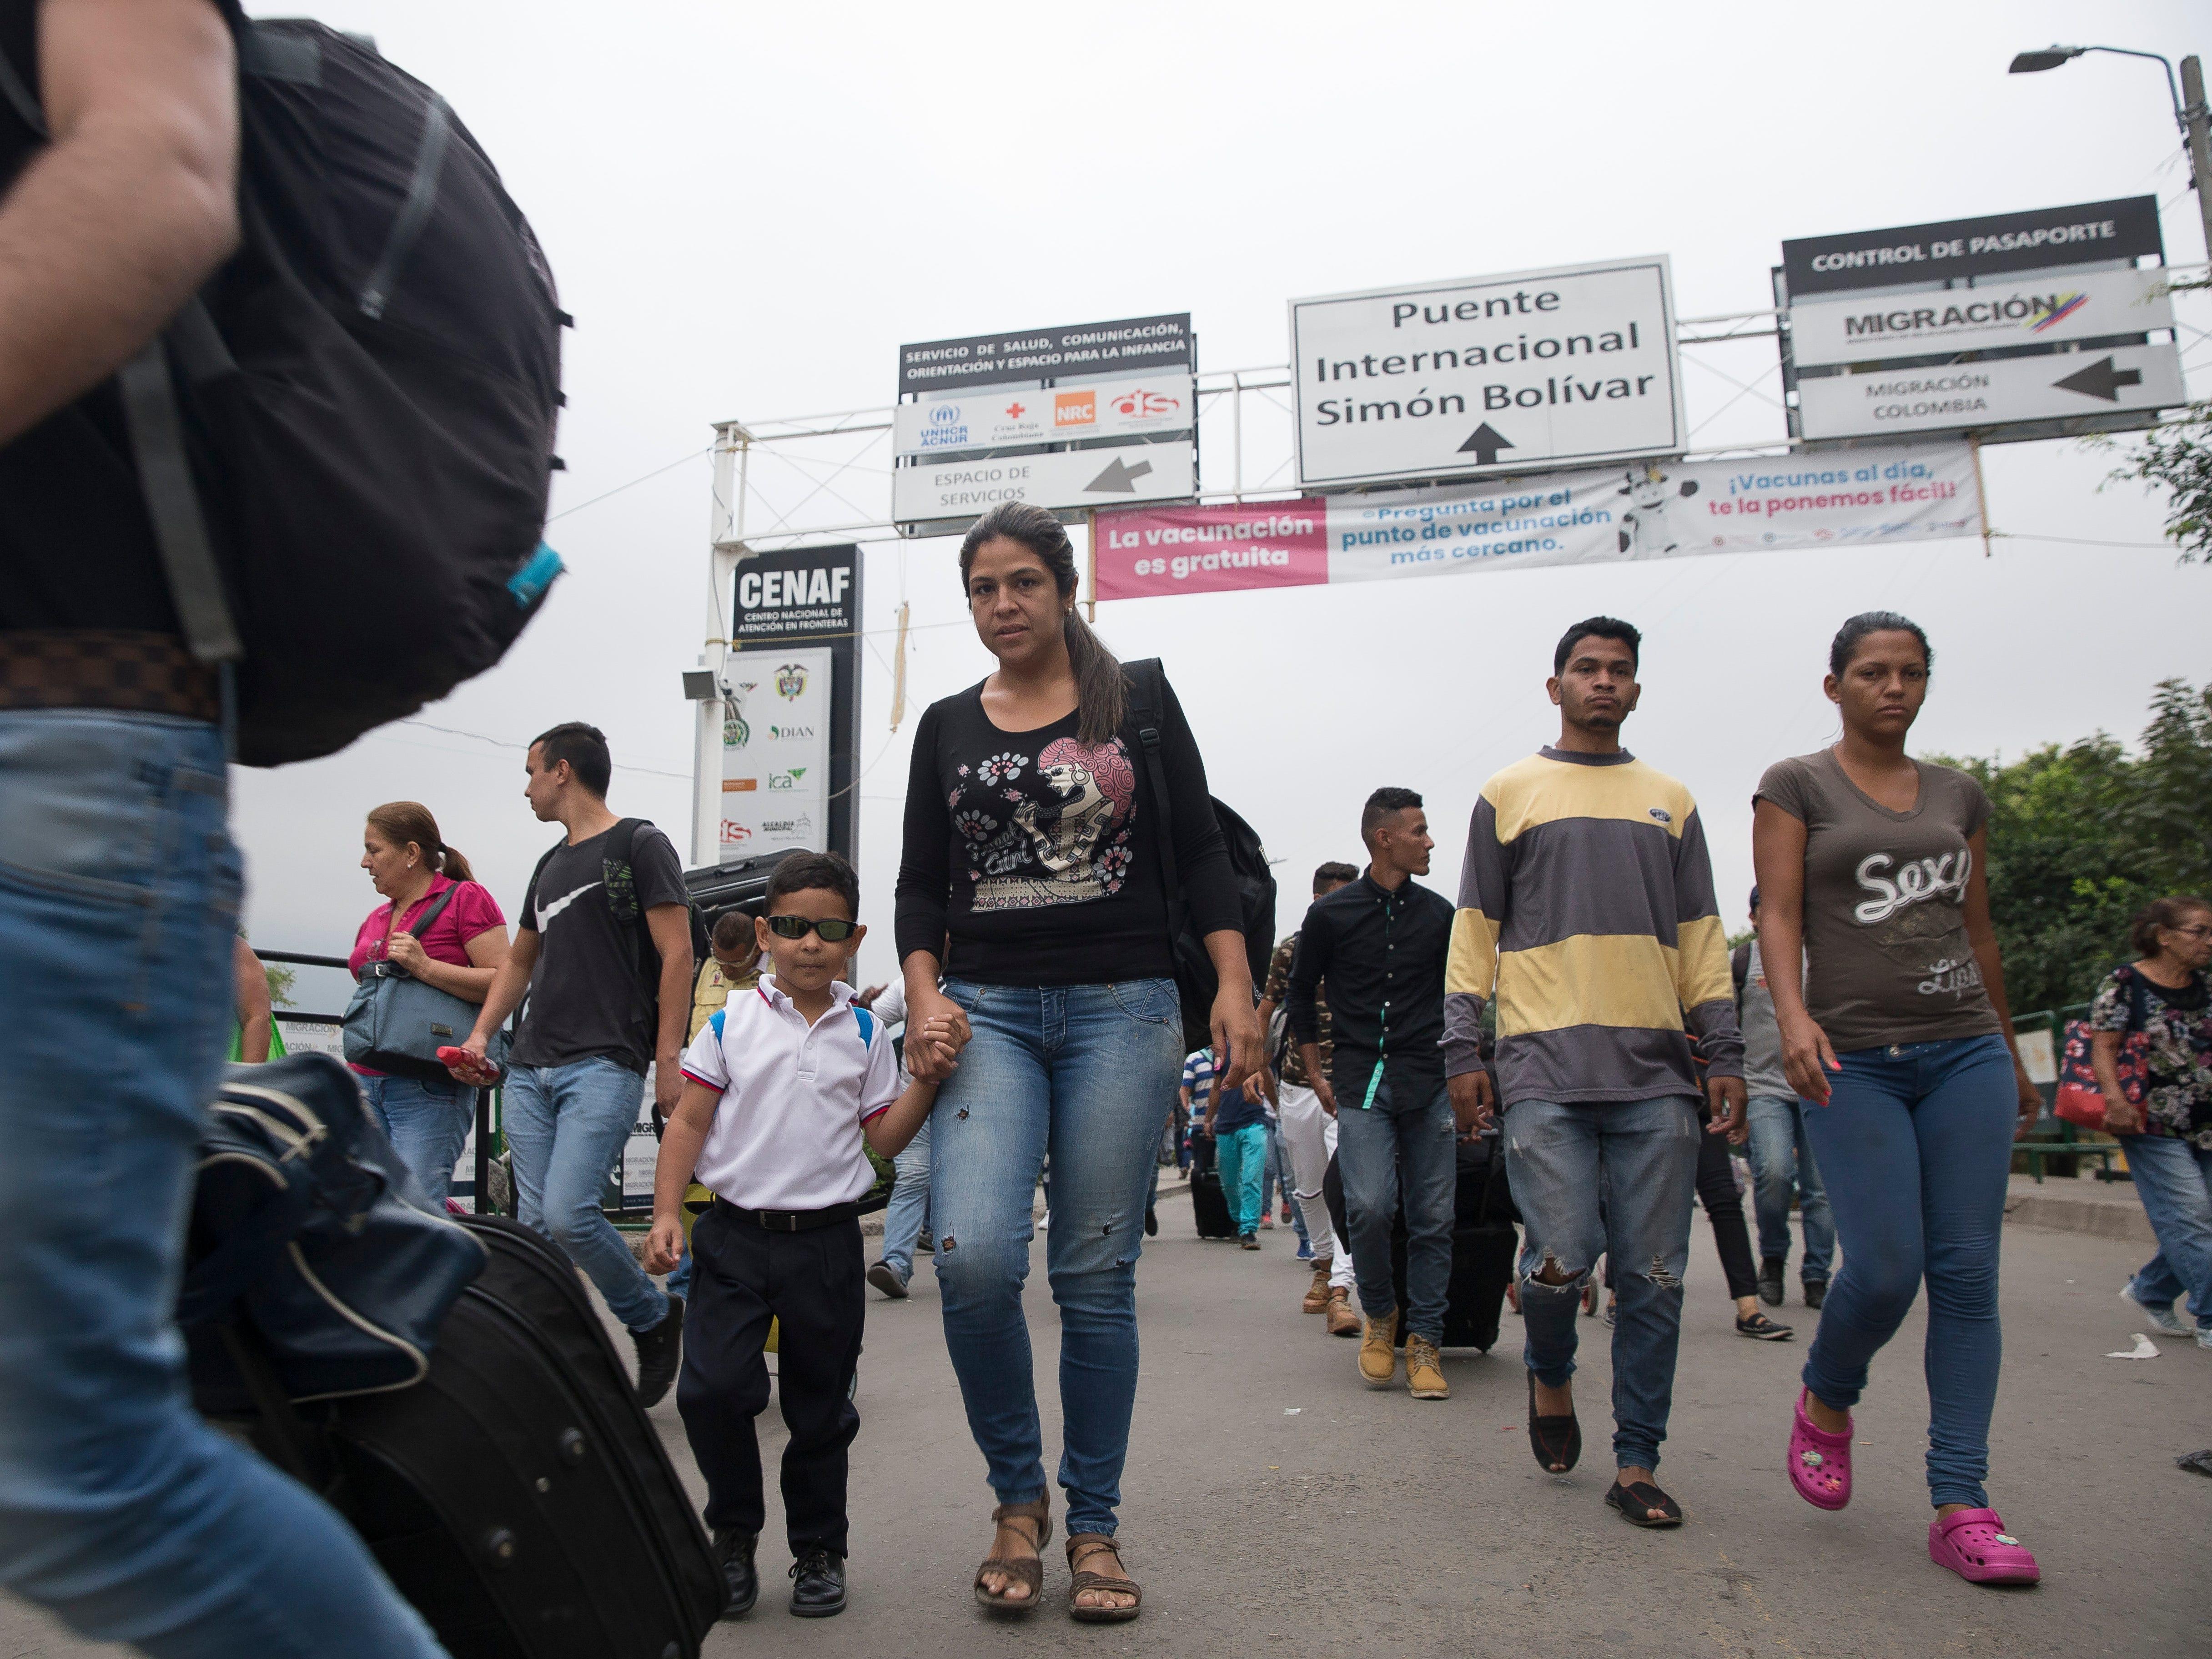 A flood of migrants cross the Colombia-Venezuela border on Feb. 6, 2019.